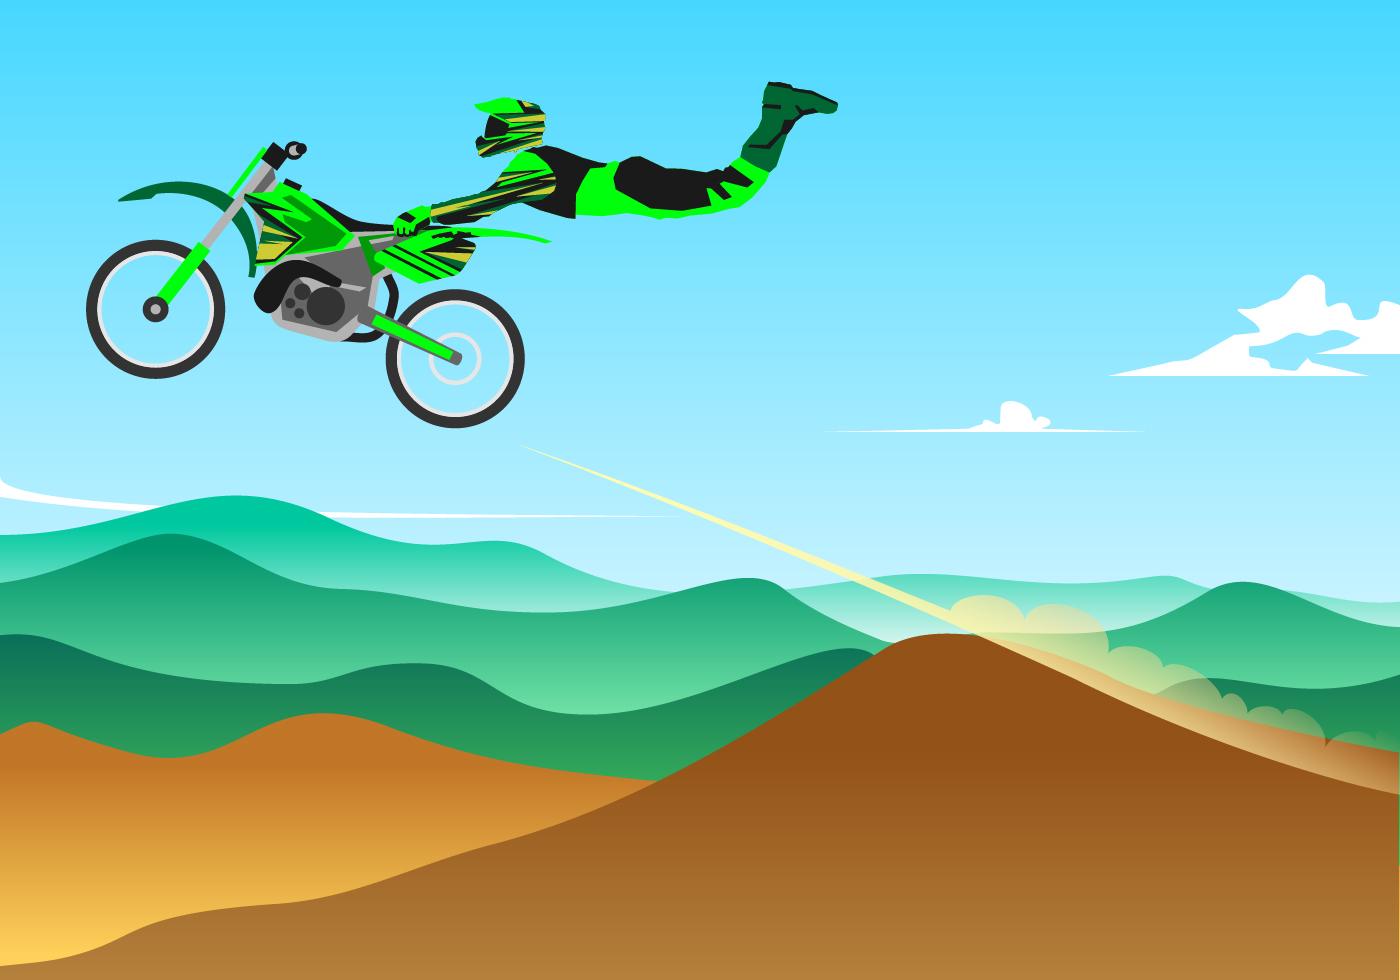 Motocross Jump Free Vector Art - (978 Free Downloads)